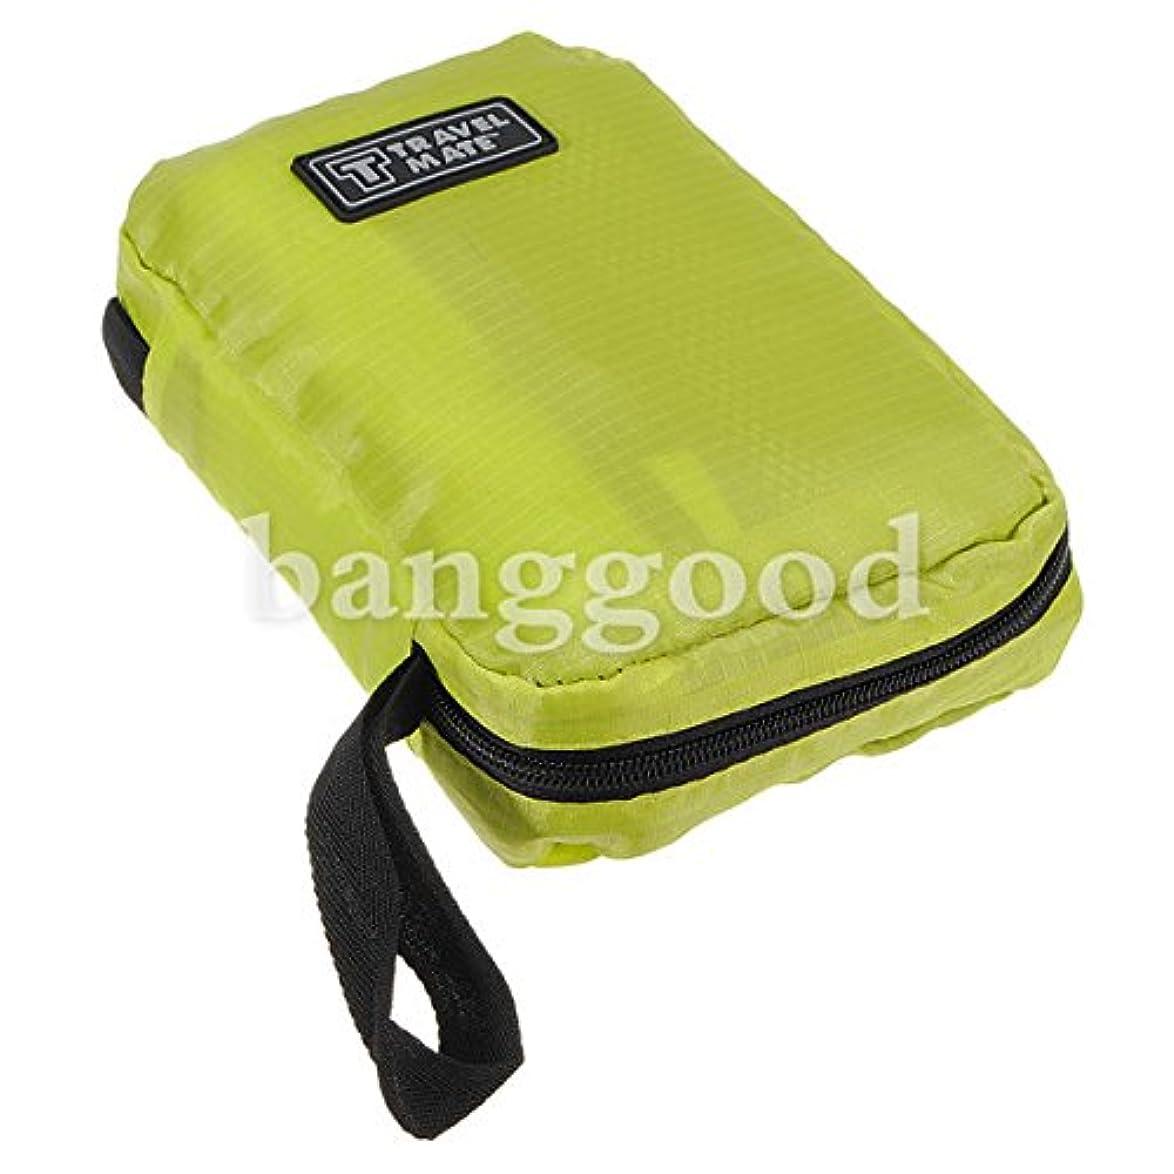 GUQQRZCT 旅行ナイロンウォッシュバッグ収納オーガナイザーメッシュジッパー (Color : Color Green)